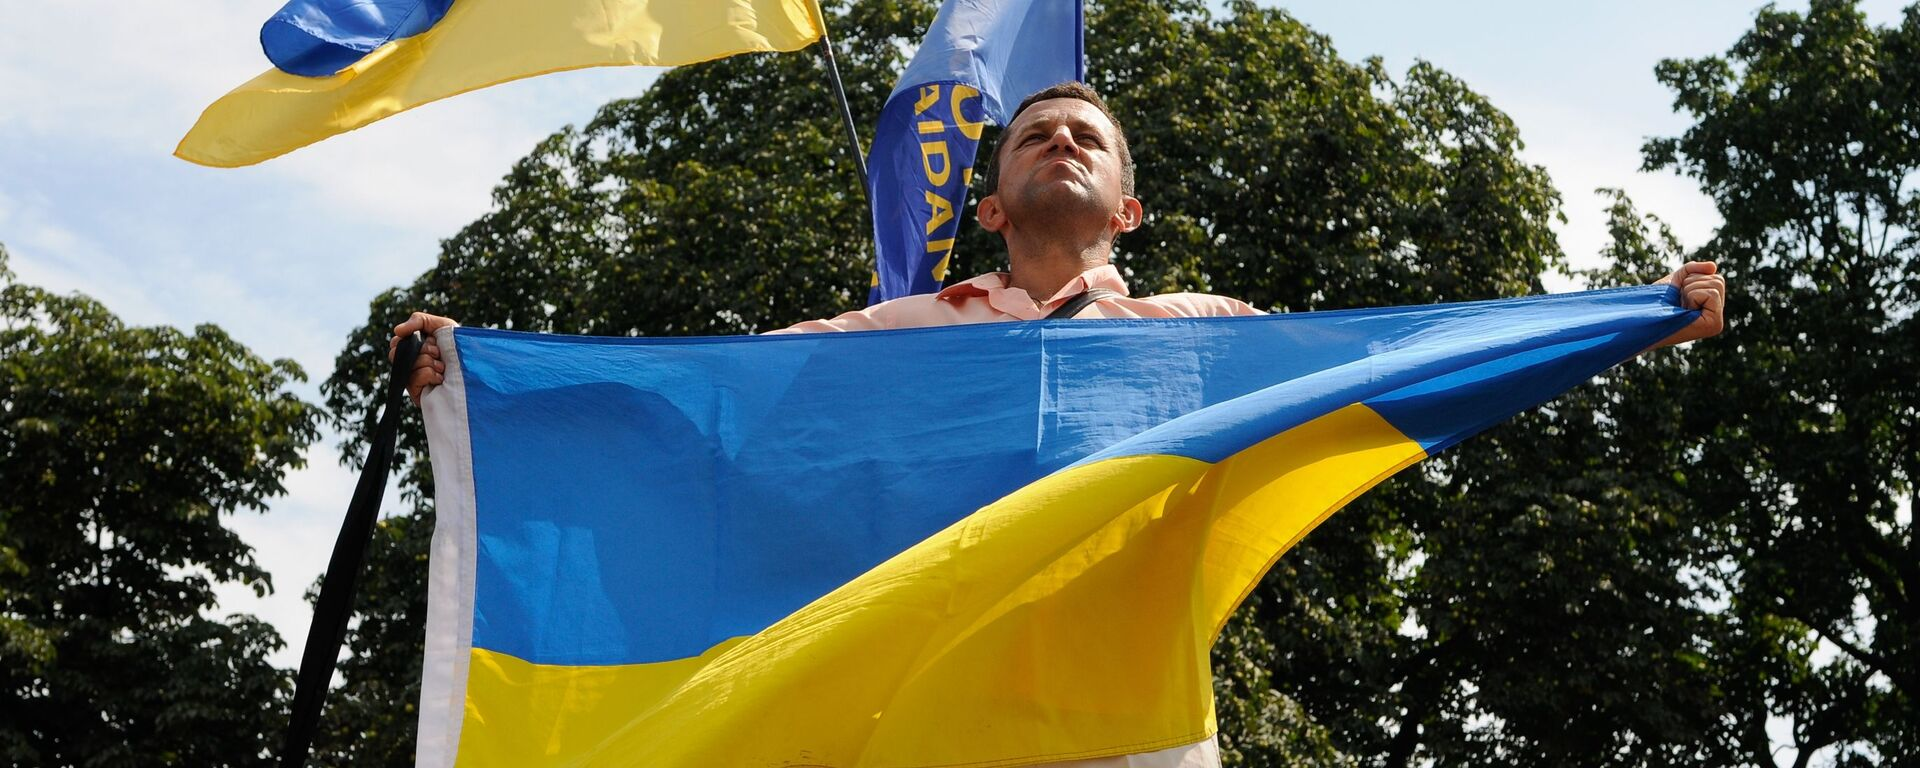 Мужчина с флагом Украины - Sputnik Латвия, 1920, 30.09.2021